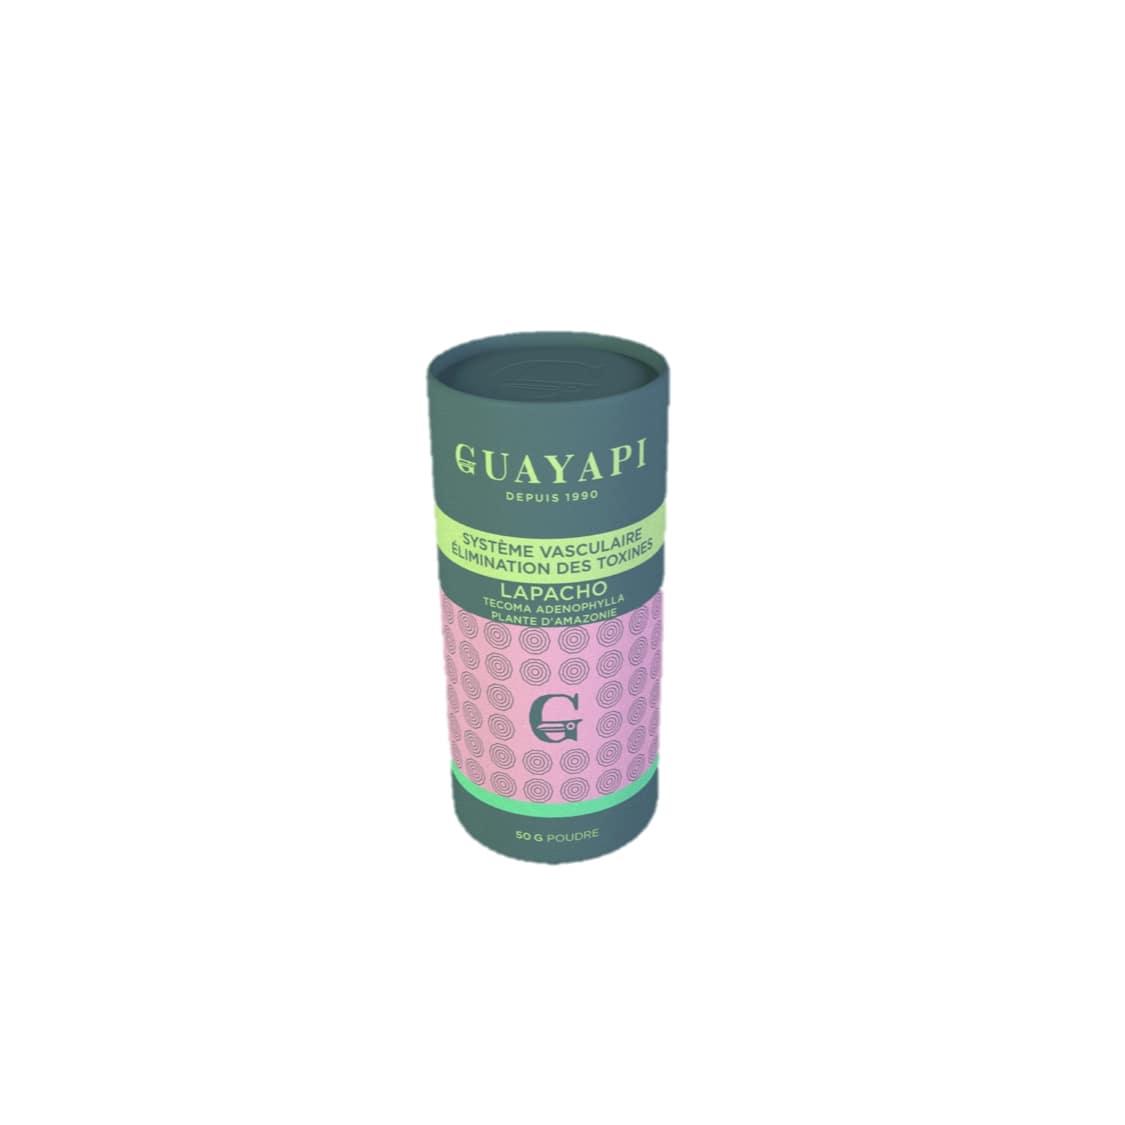 Guayapi - TECOMA ADENOPHYLLA ou LAPACHO - 80 Comprimés